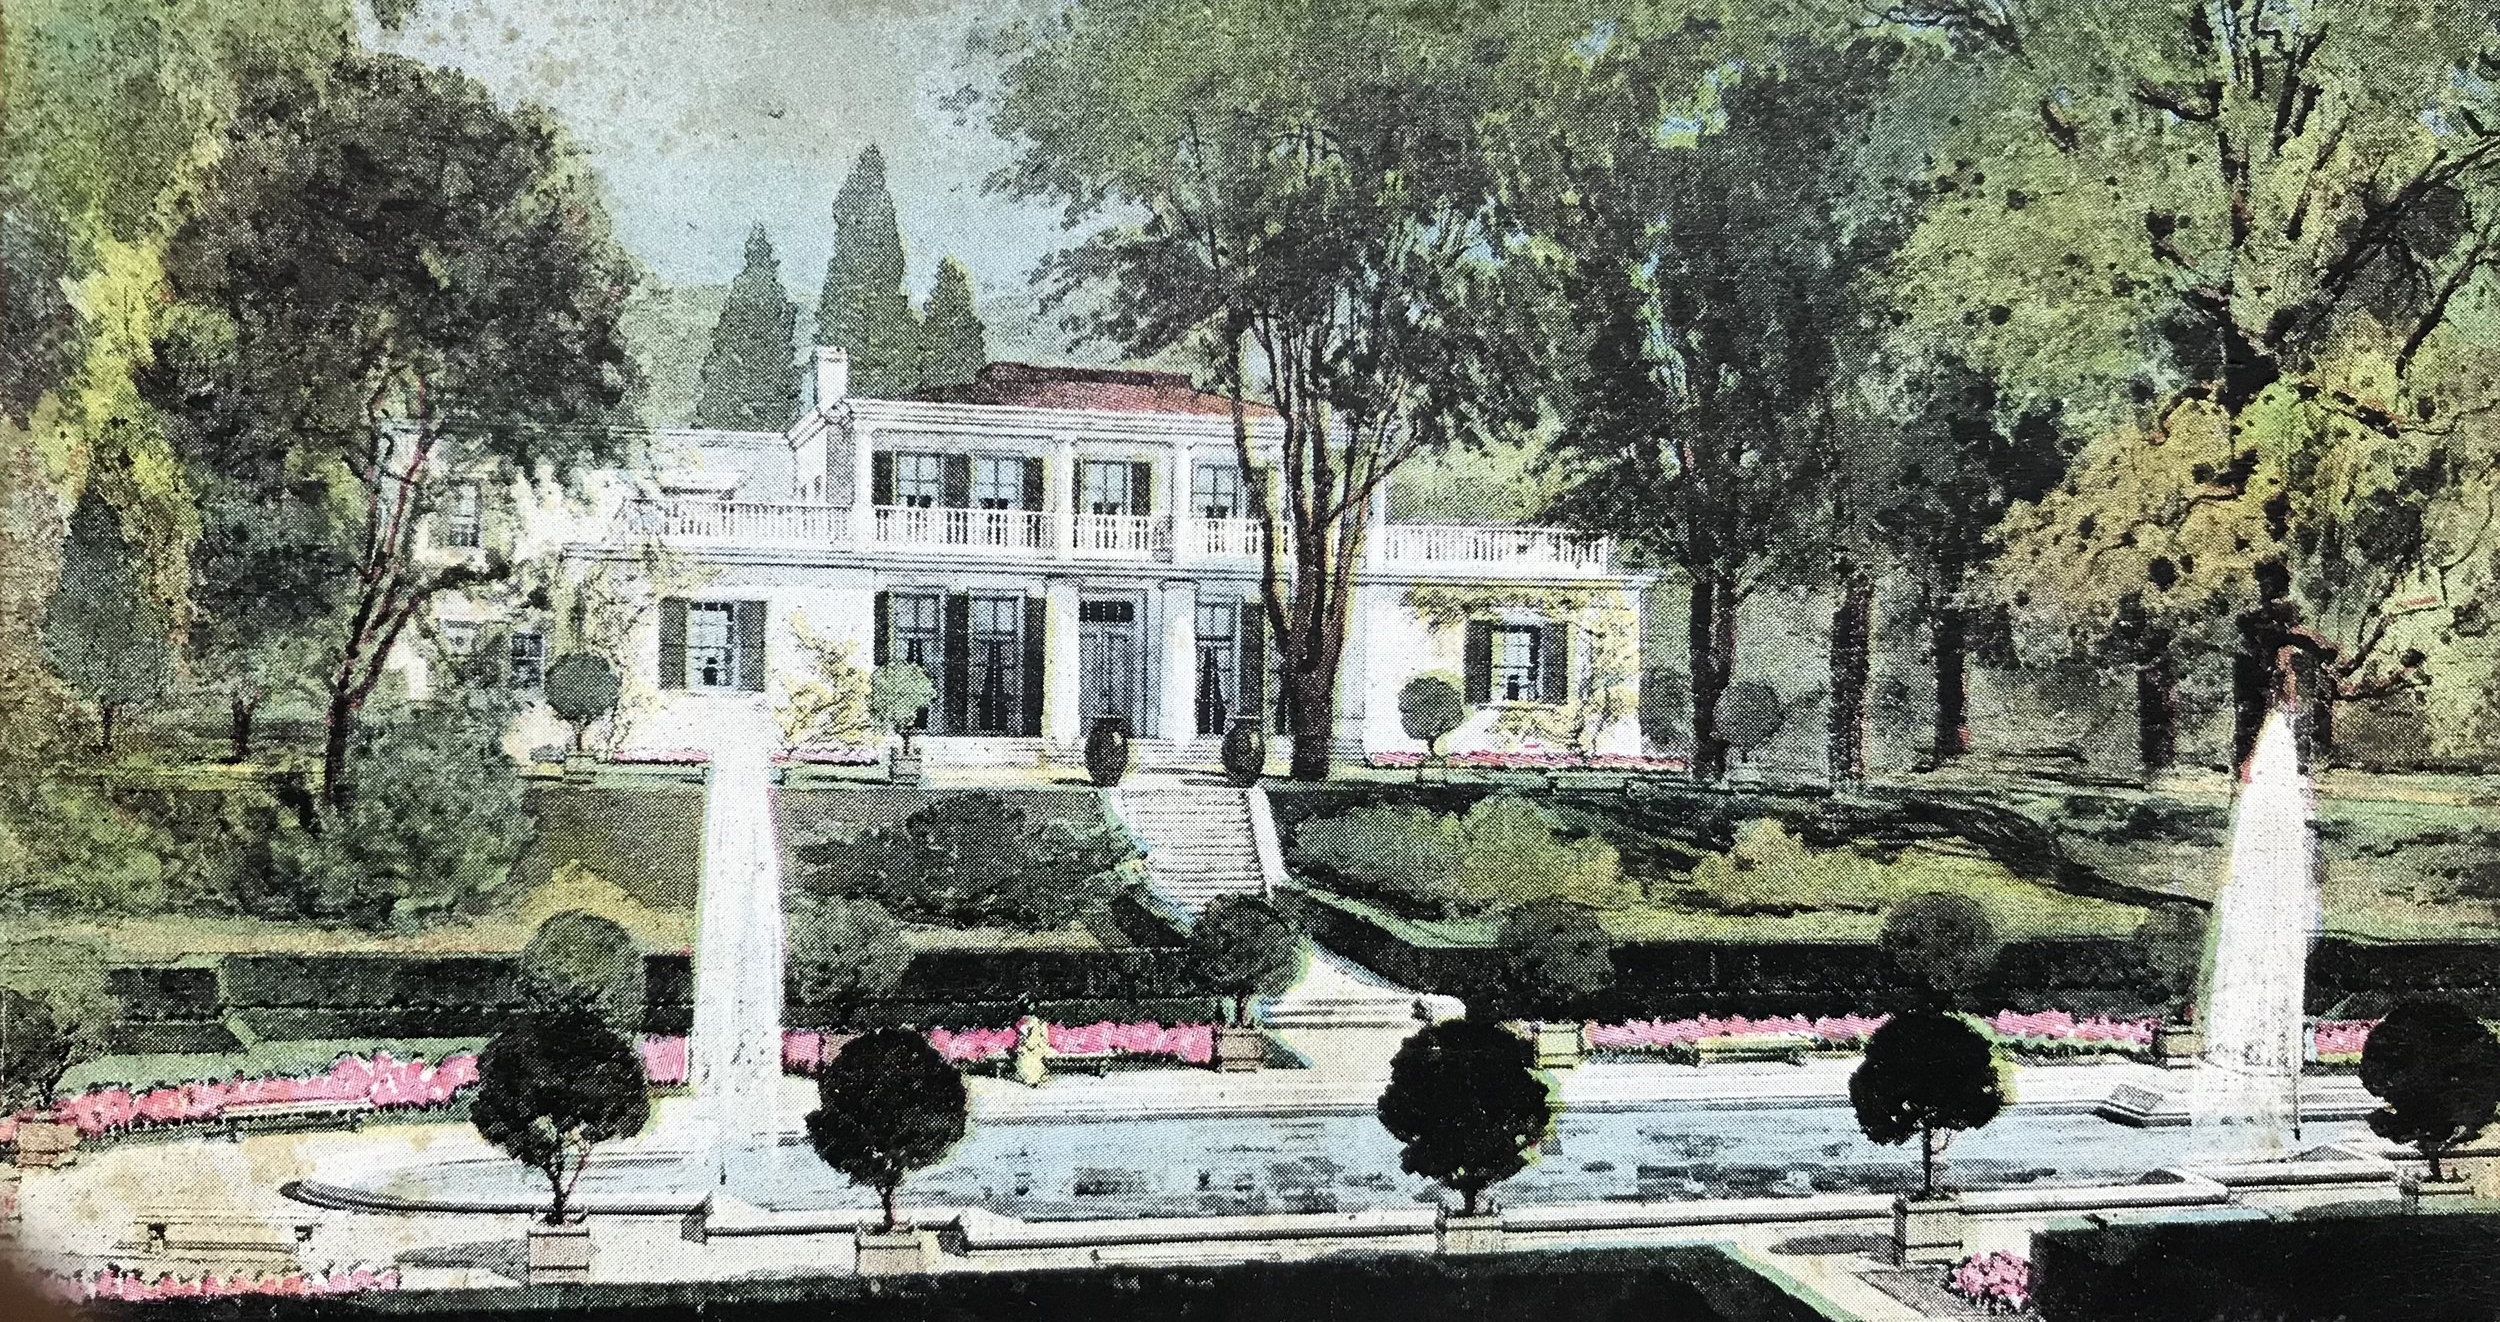 Haubold-Powder Mill House as the Greenacres Tea house, c. 1913.